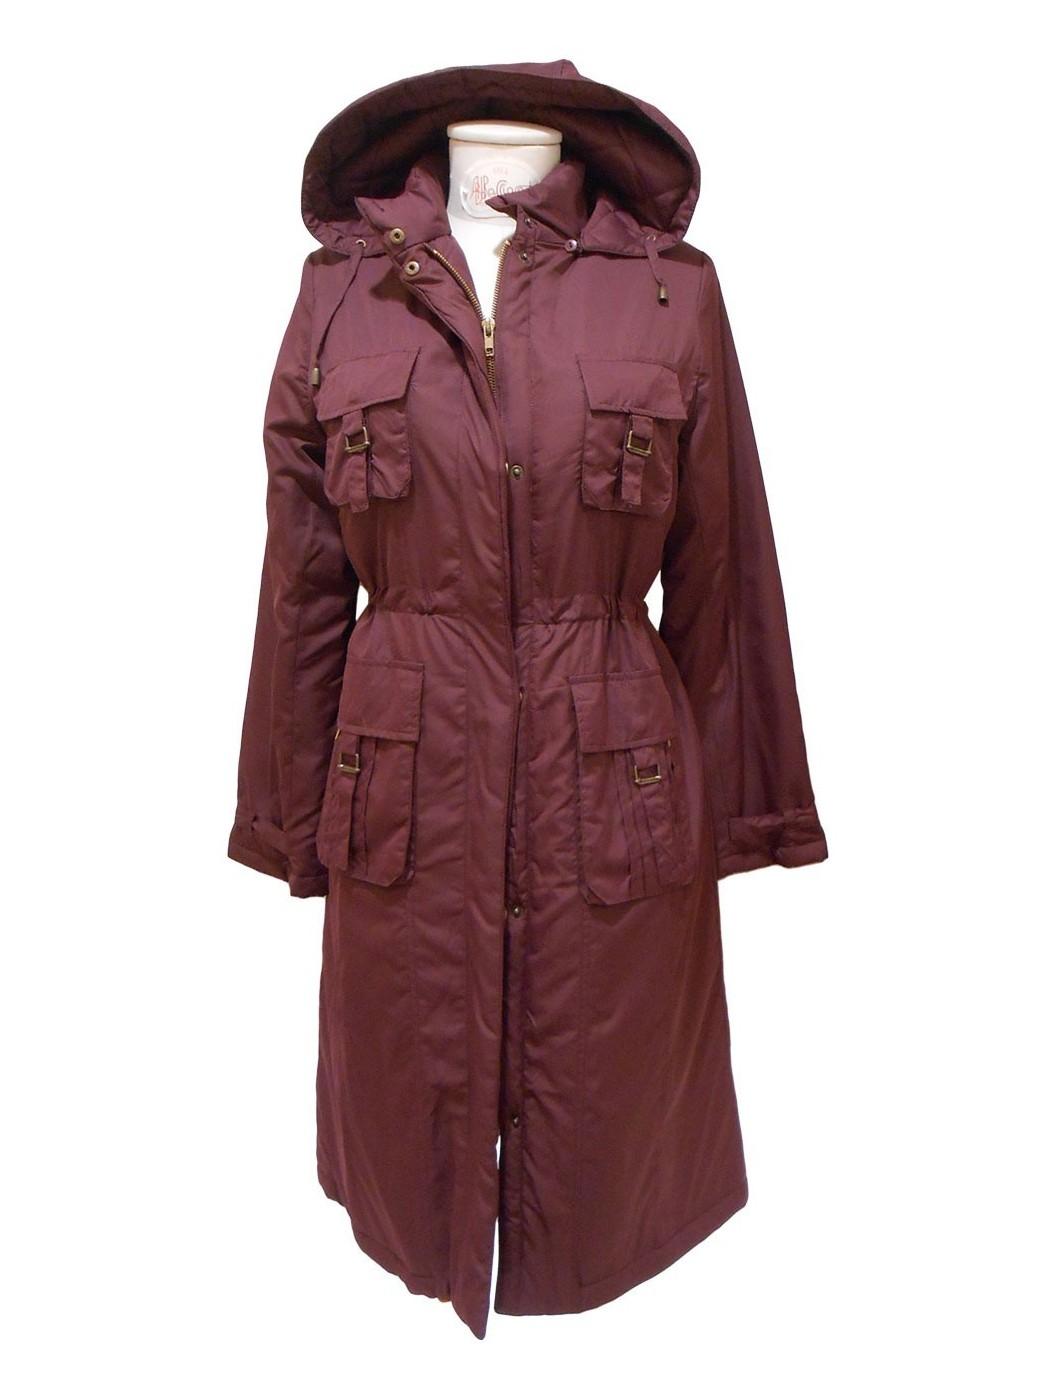 Padded long jacket by Paul...